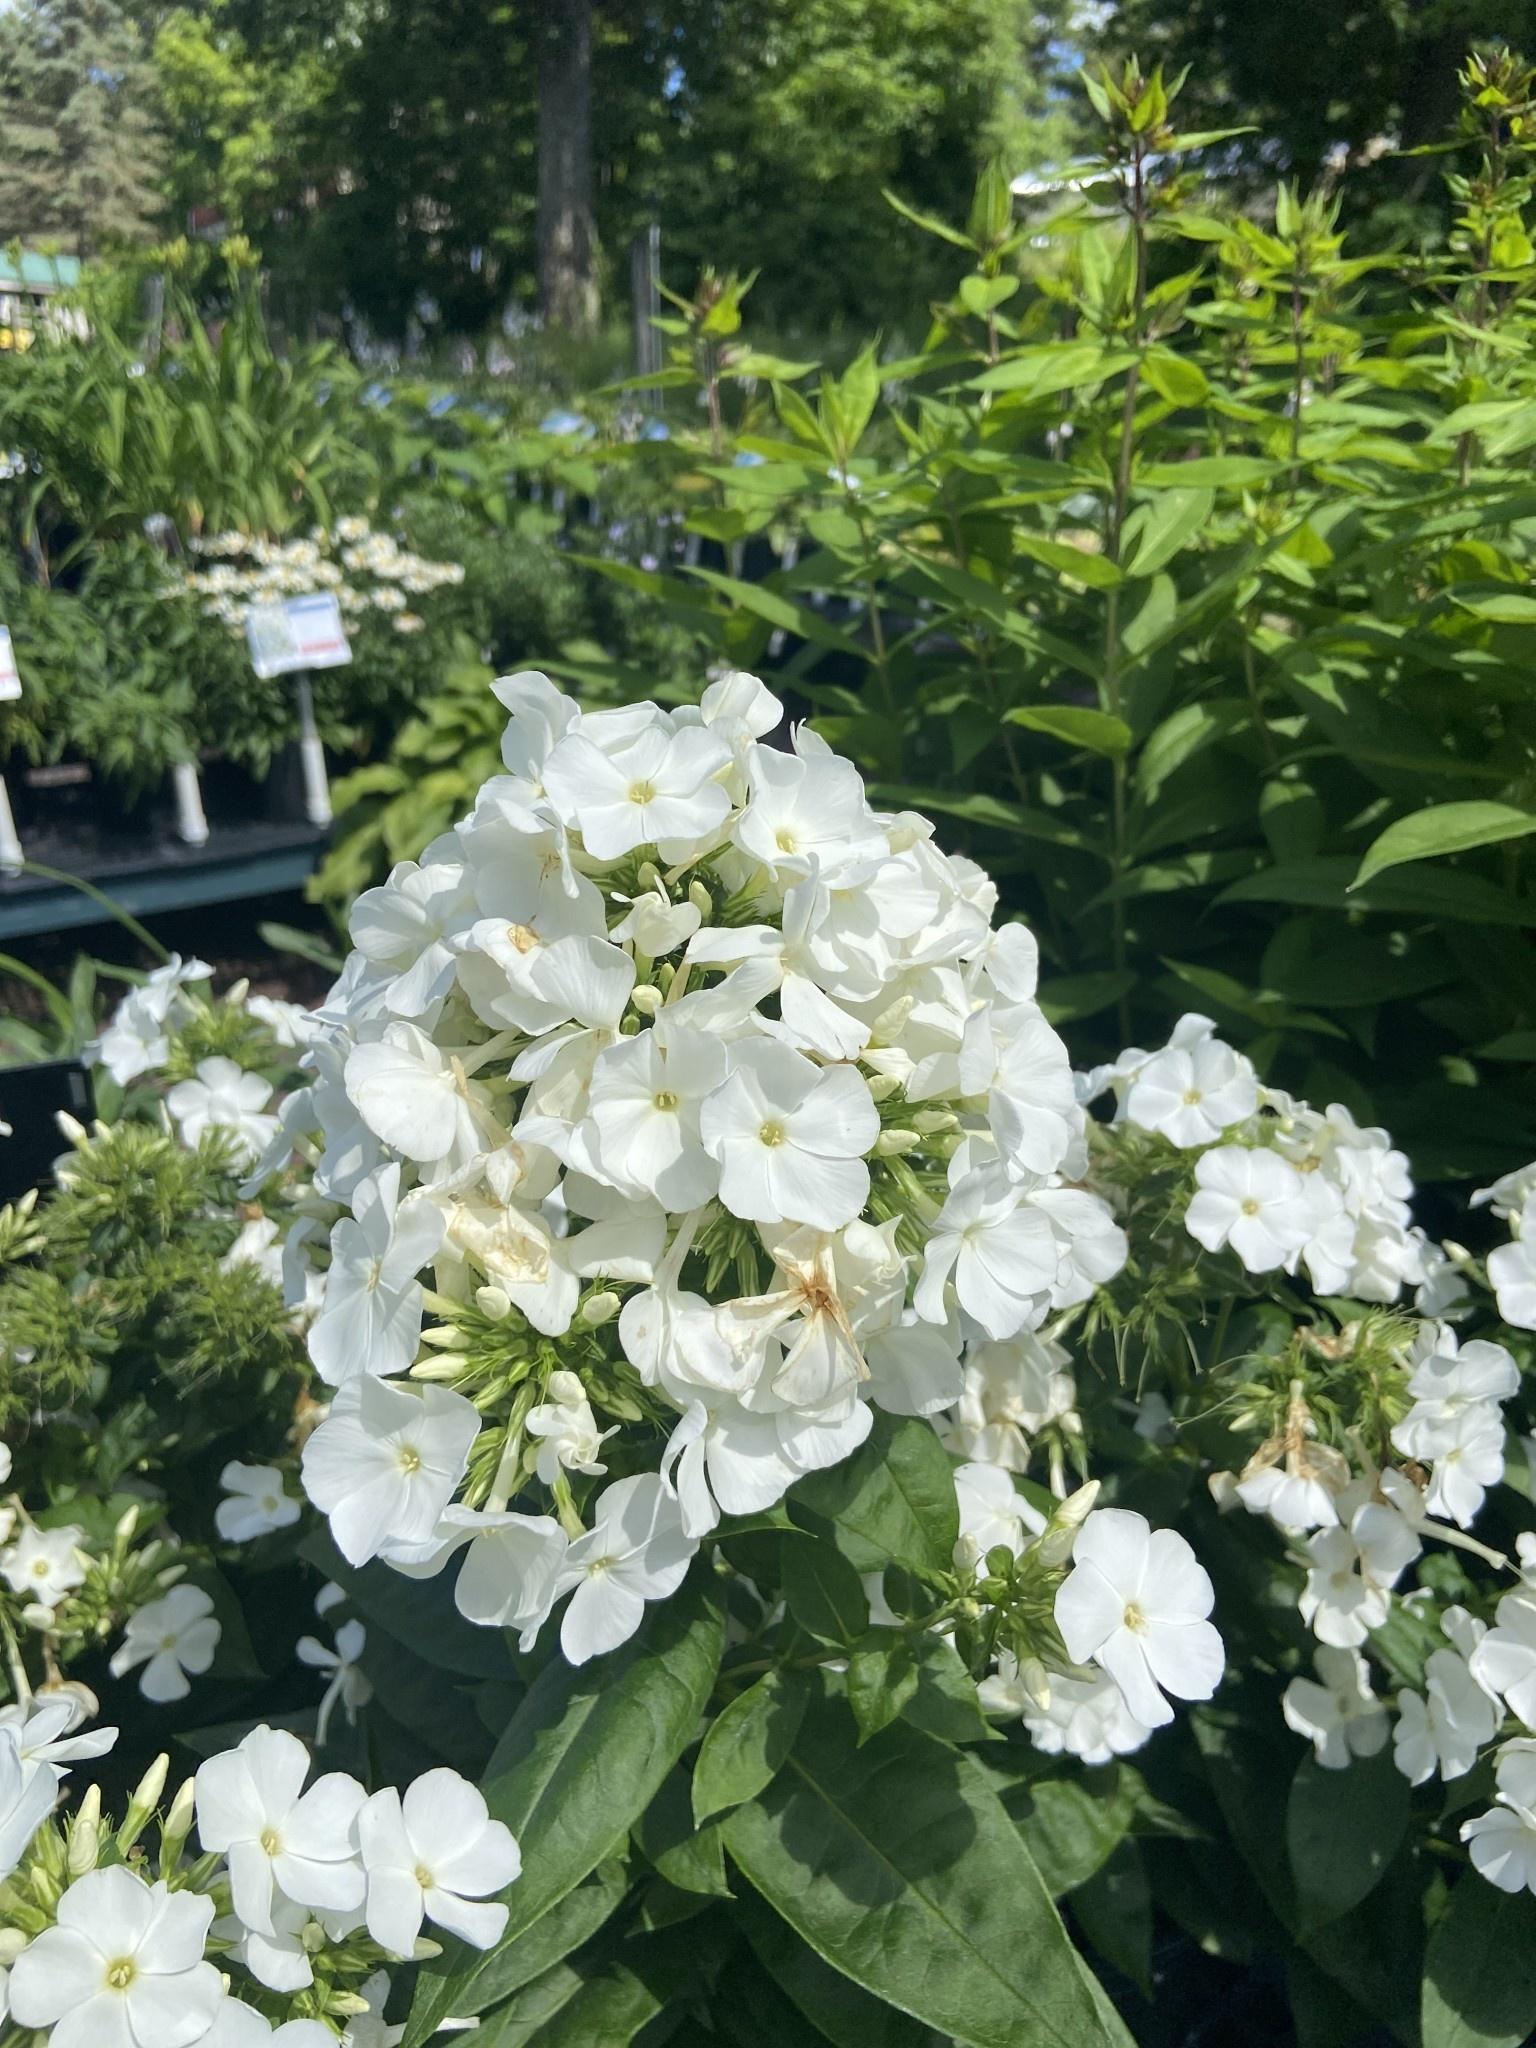 Phlox pan. Flame White Phlox - Garden Phlox, #1